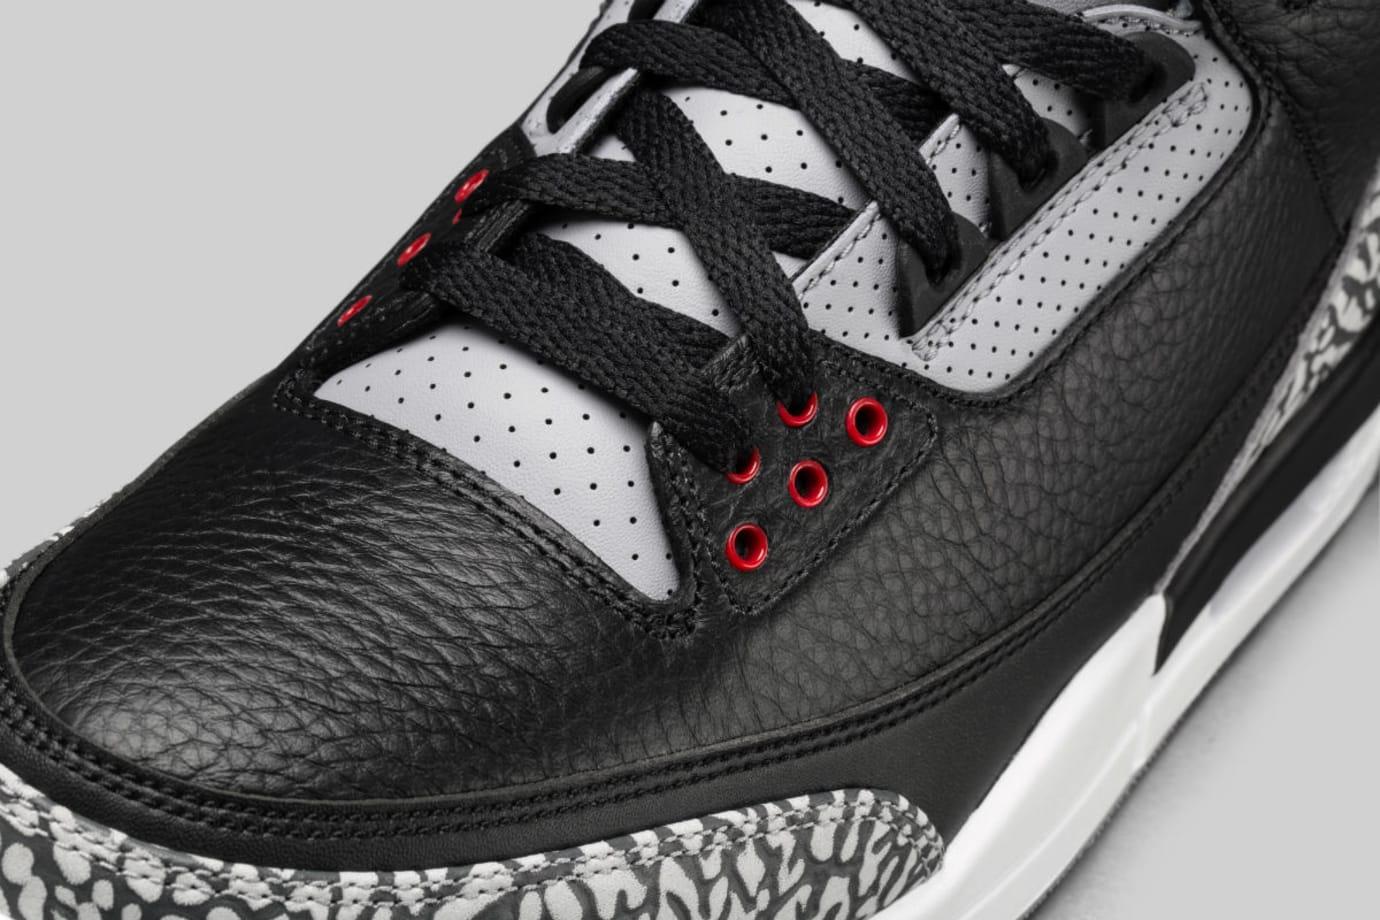 Air Jordan 3 III Black Cement Release Date 854262-001 Laces